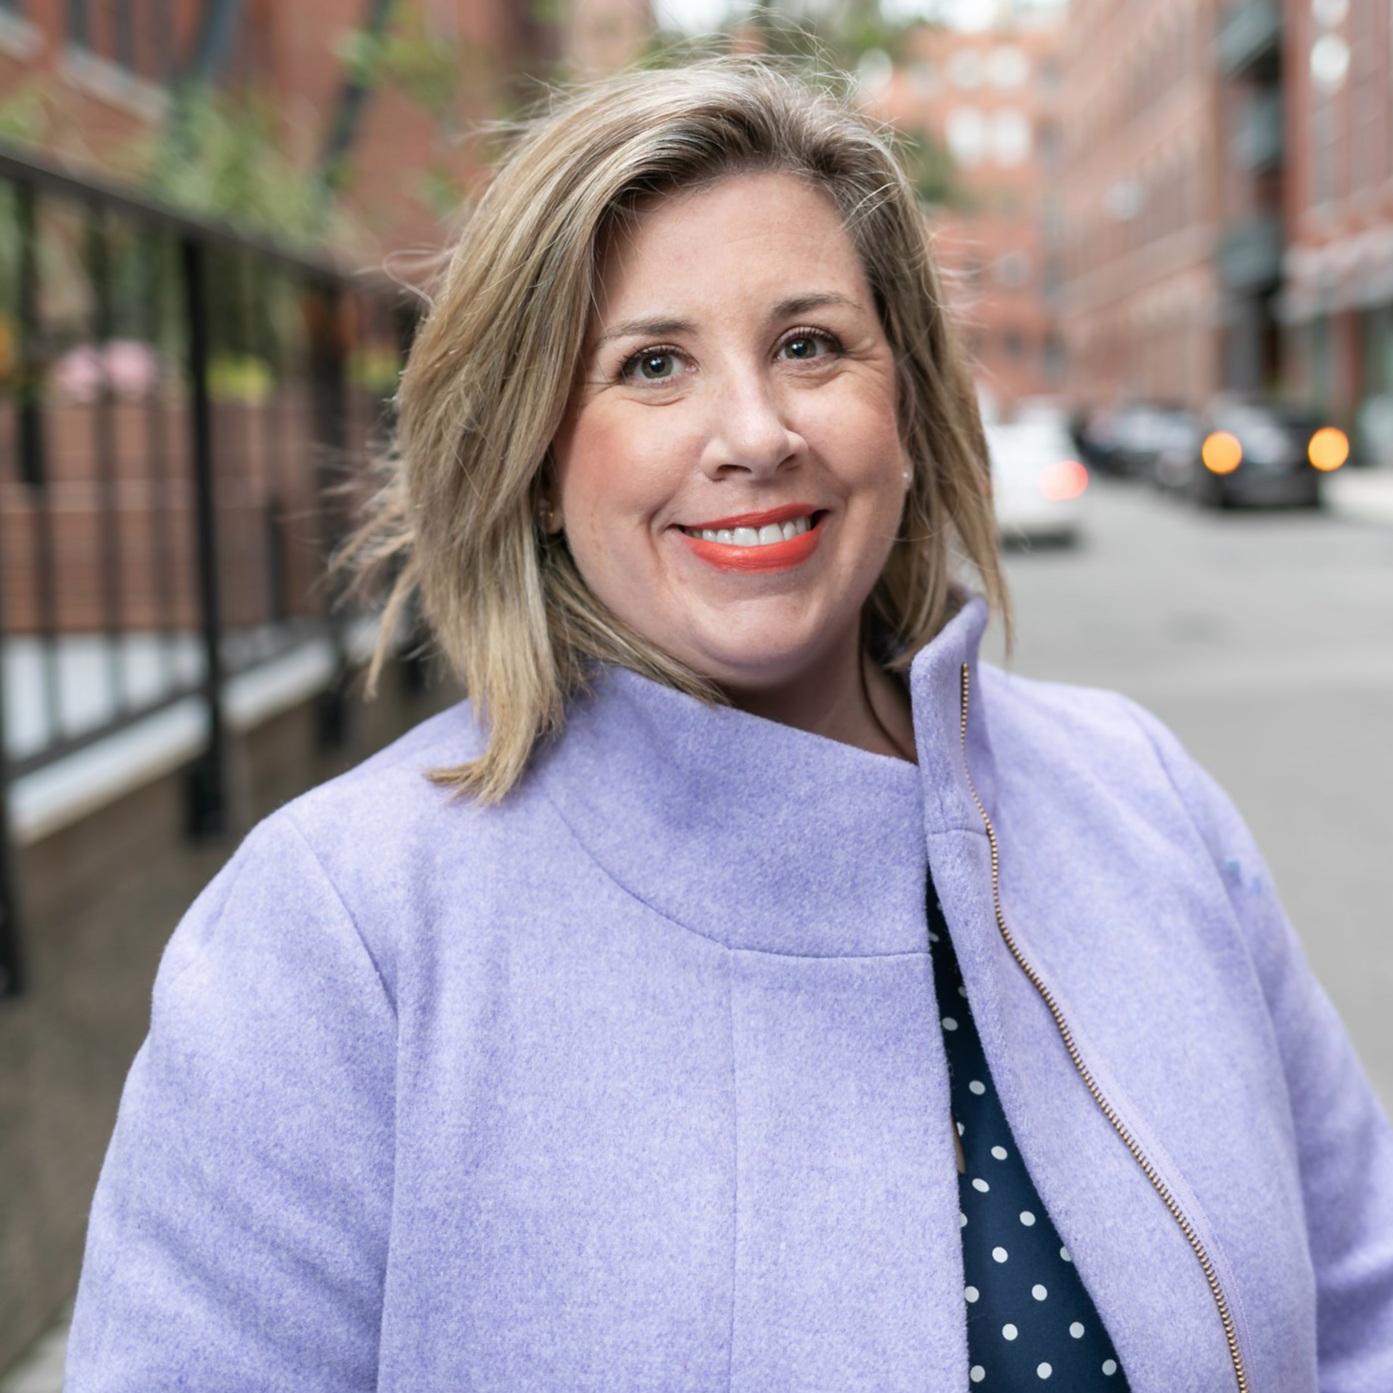 Caroline Maguire - ADHD & Executive Function Expert